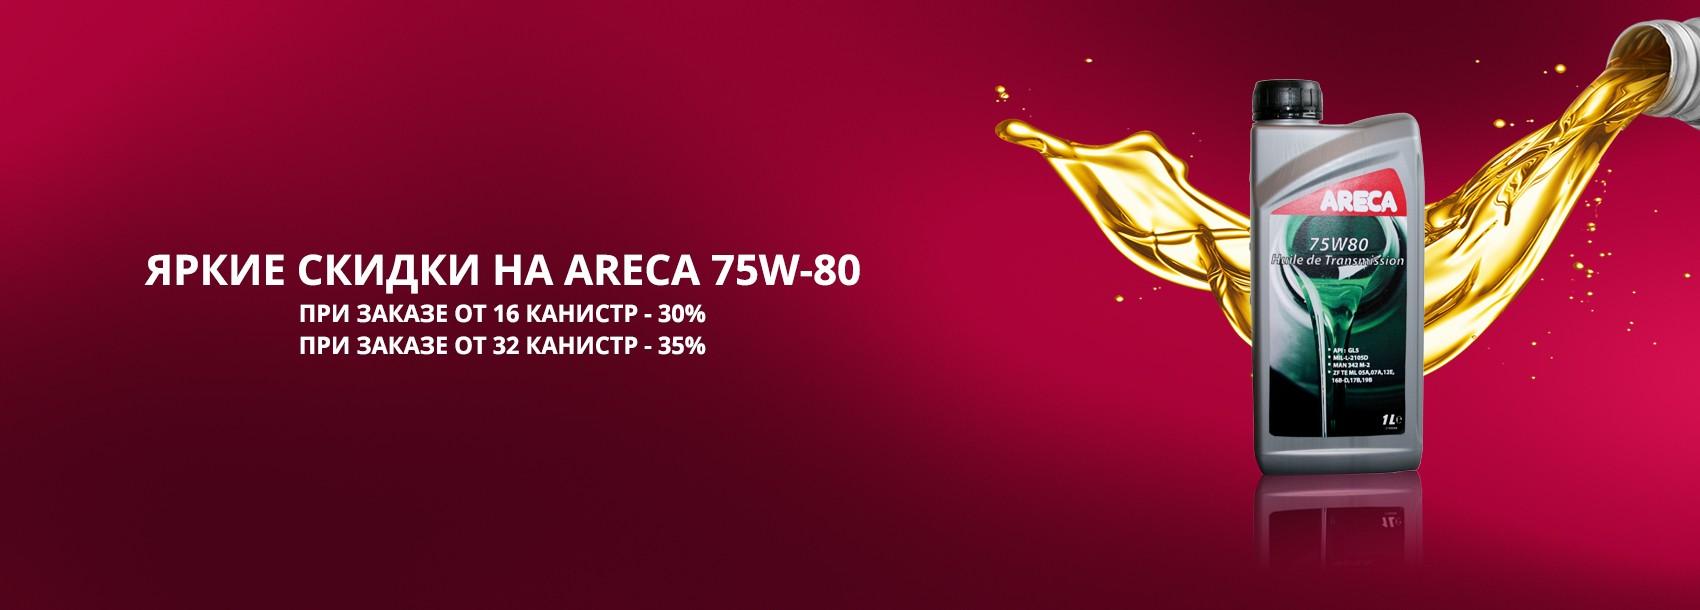 Areca: чем больше, тем дешевле